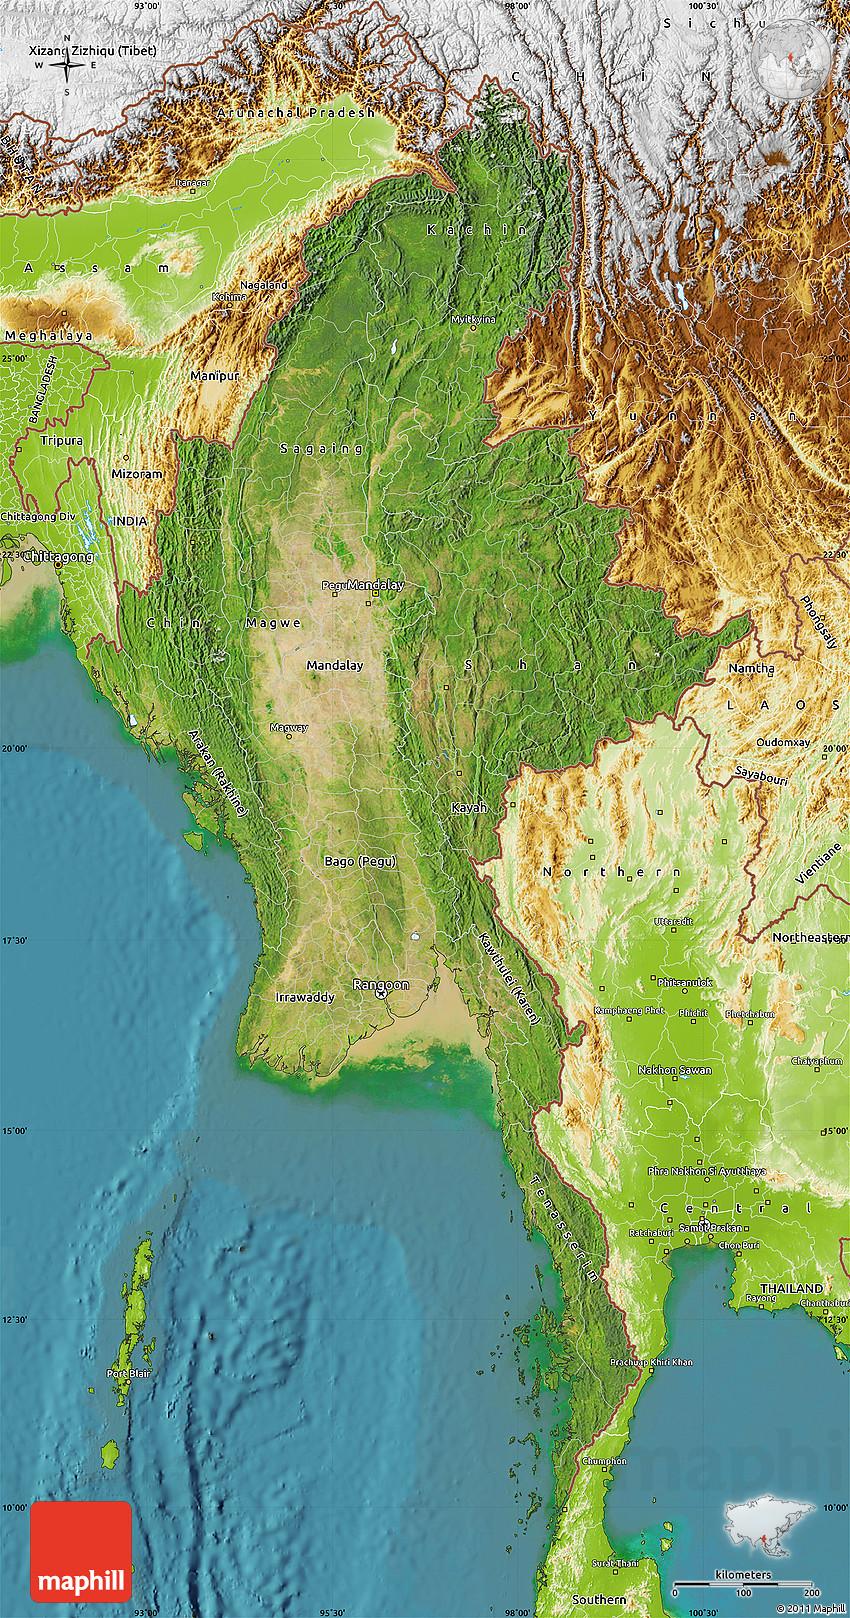 myanmar physical map - 28 images - myanmar map and myanmar satellite ...